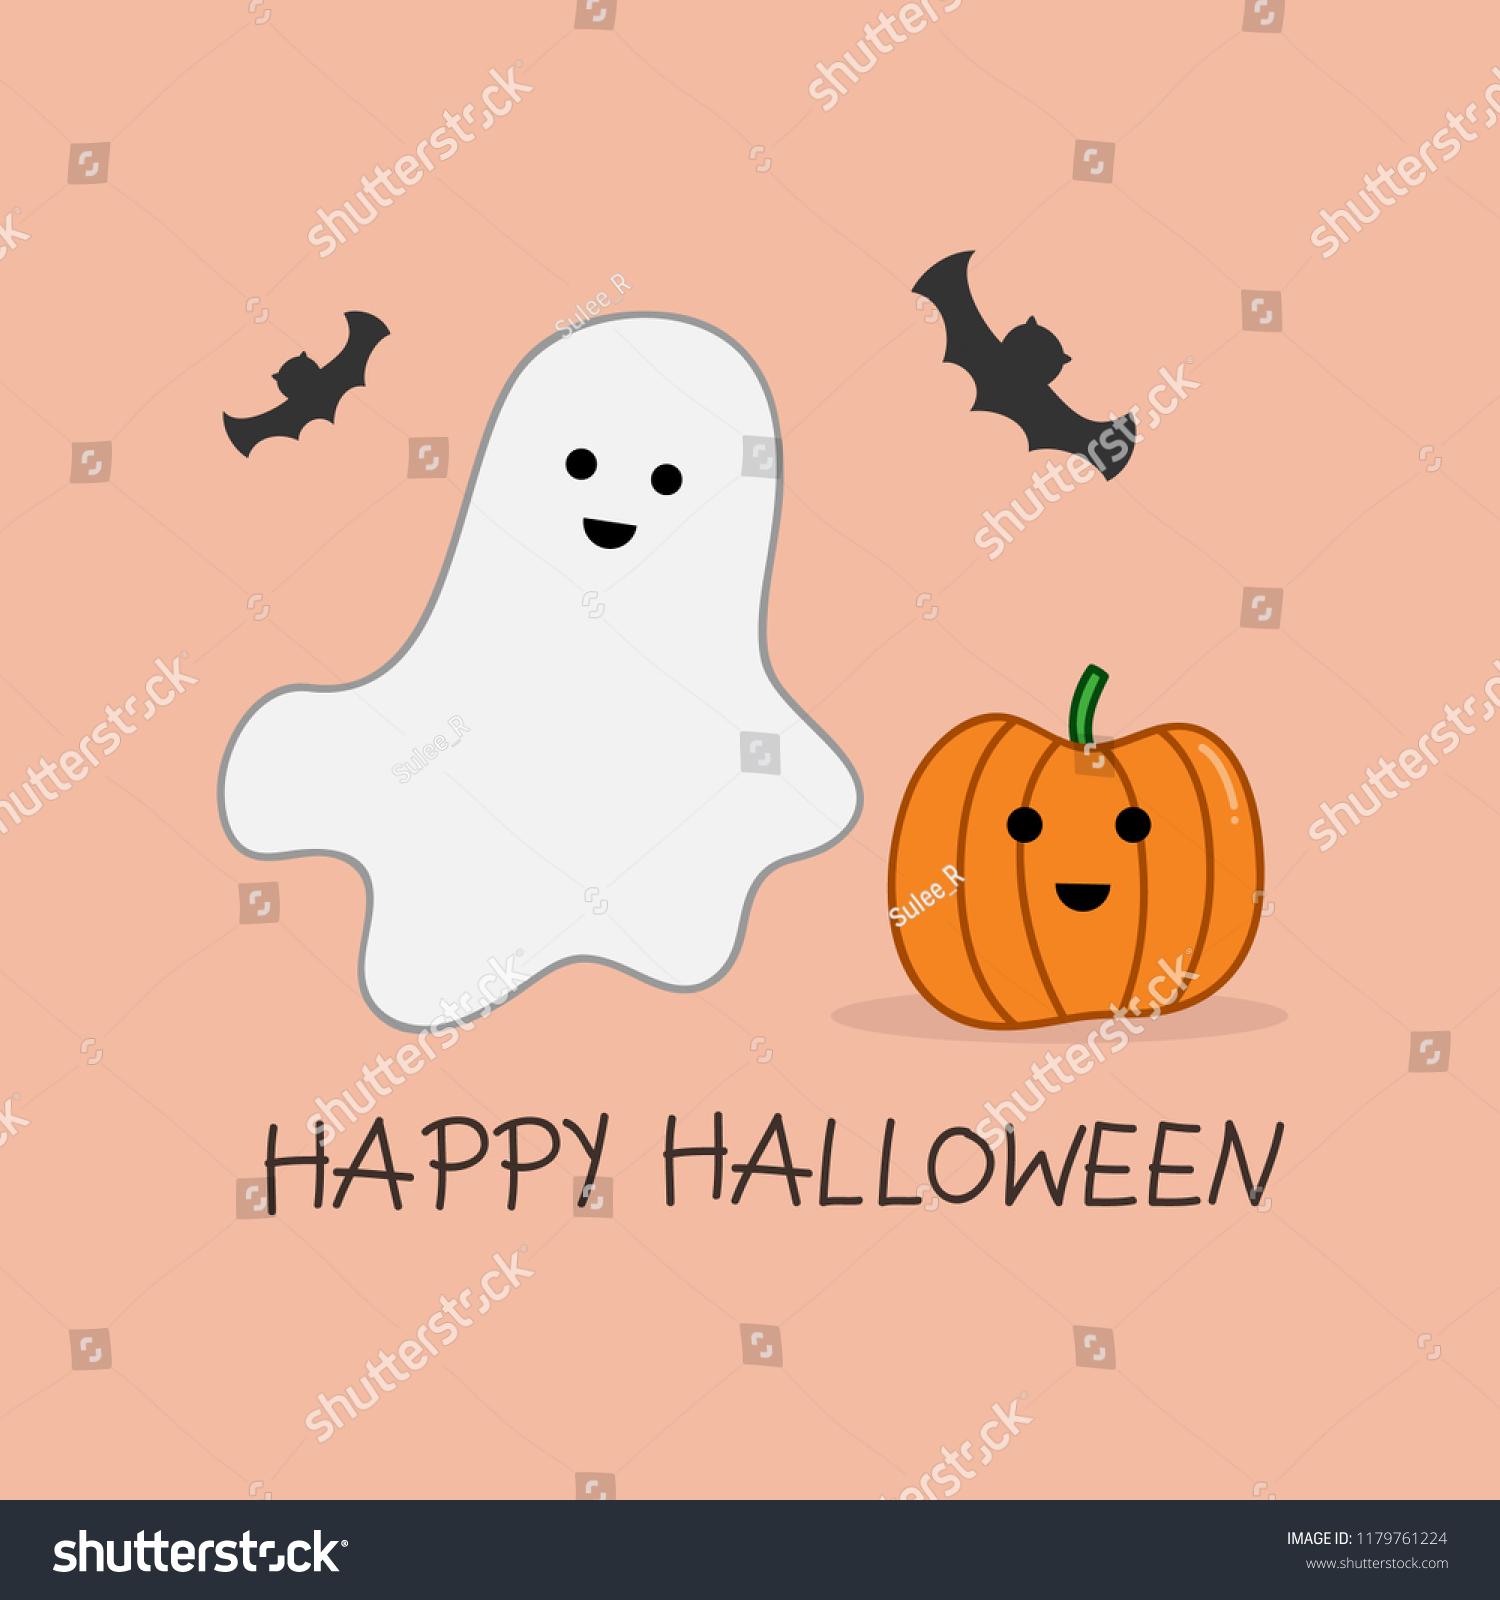 Happy halloween ghost pumpkin stock vector royalty free